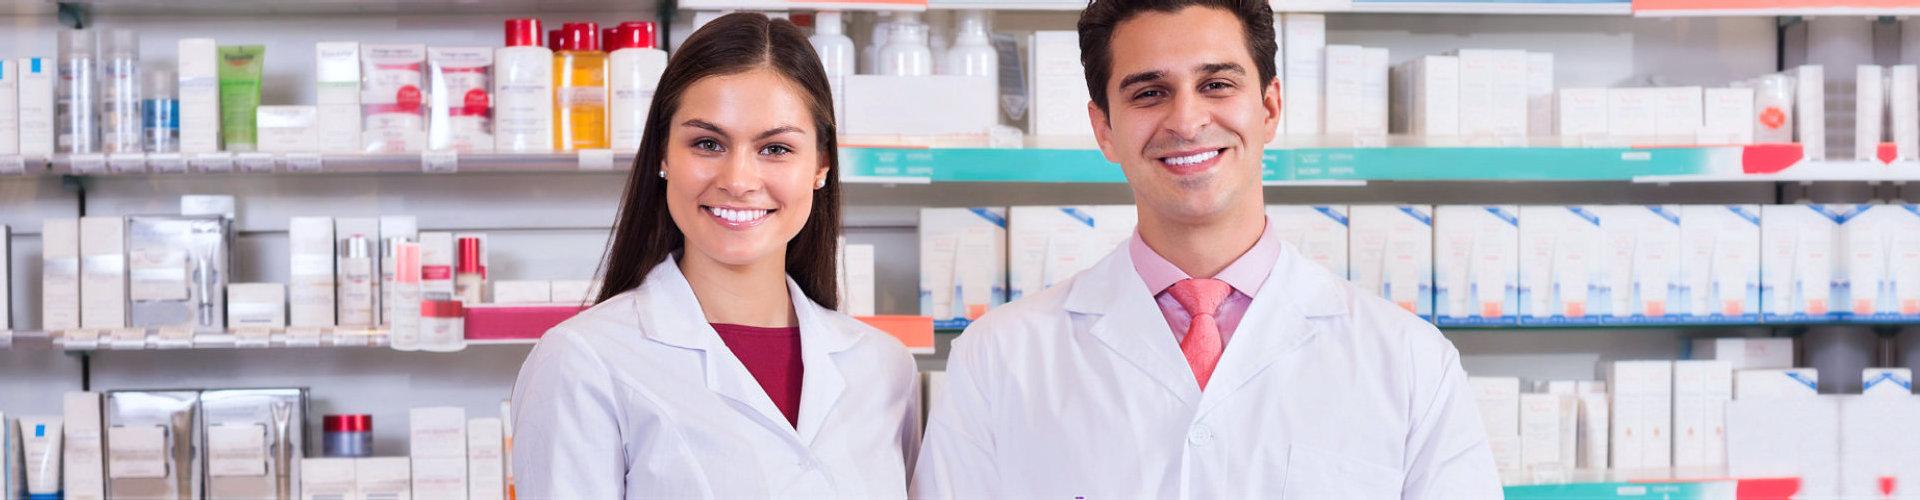 pharmacist smiling in the pharmacy